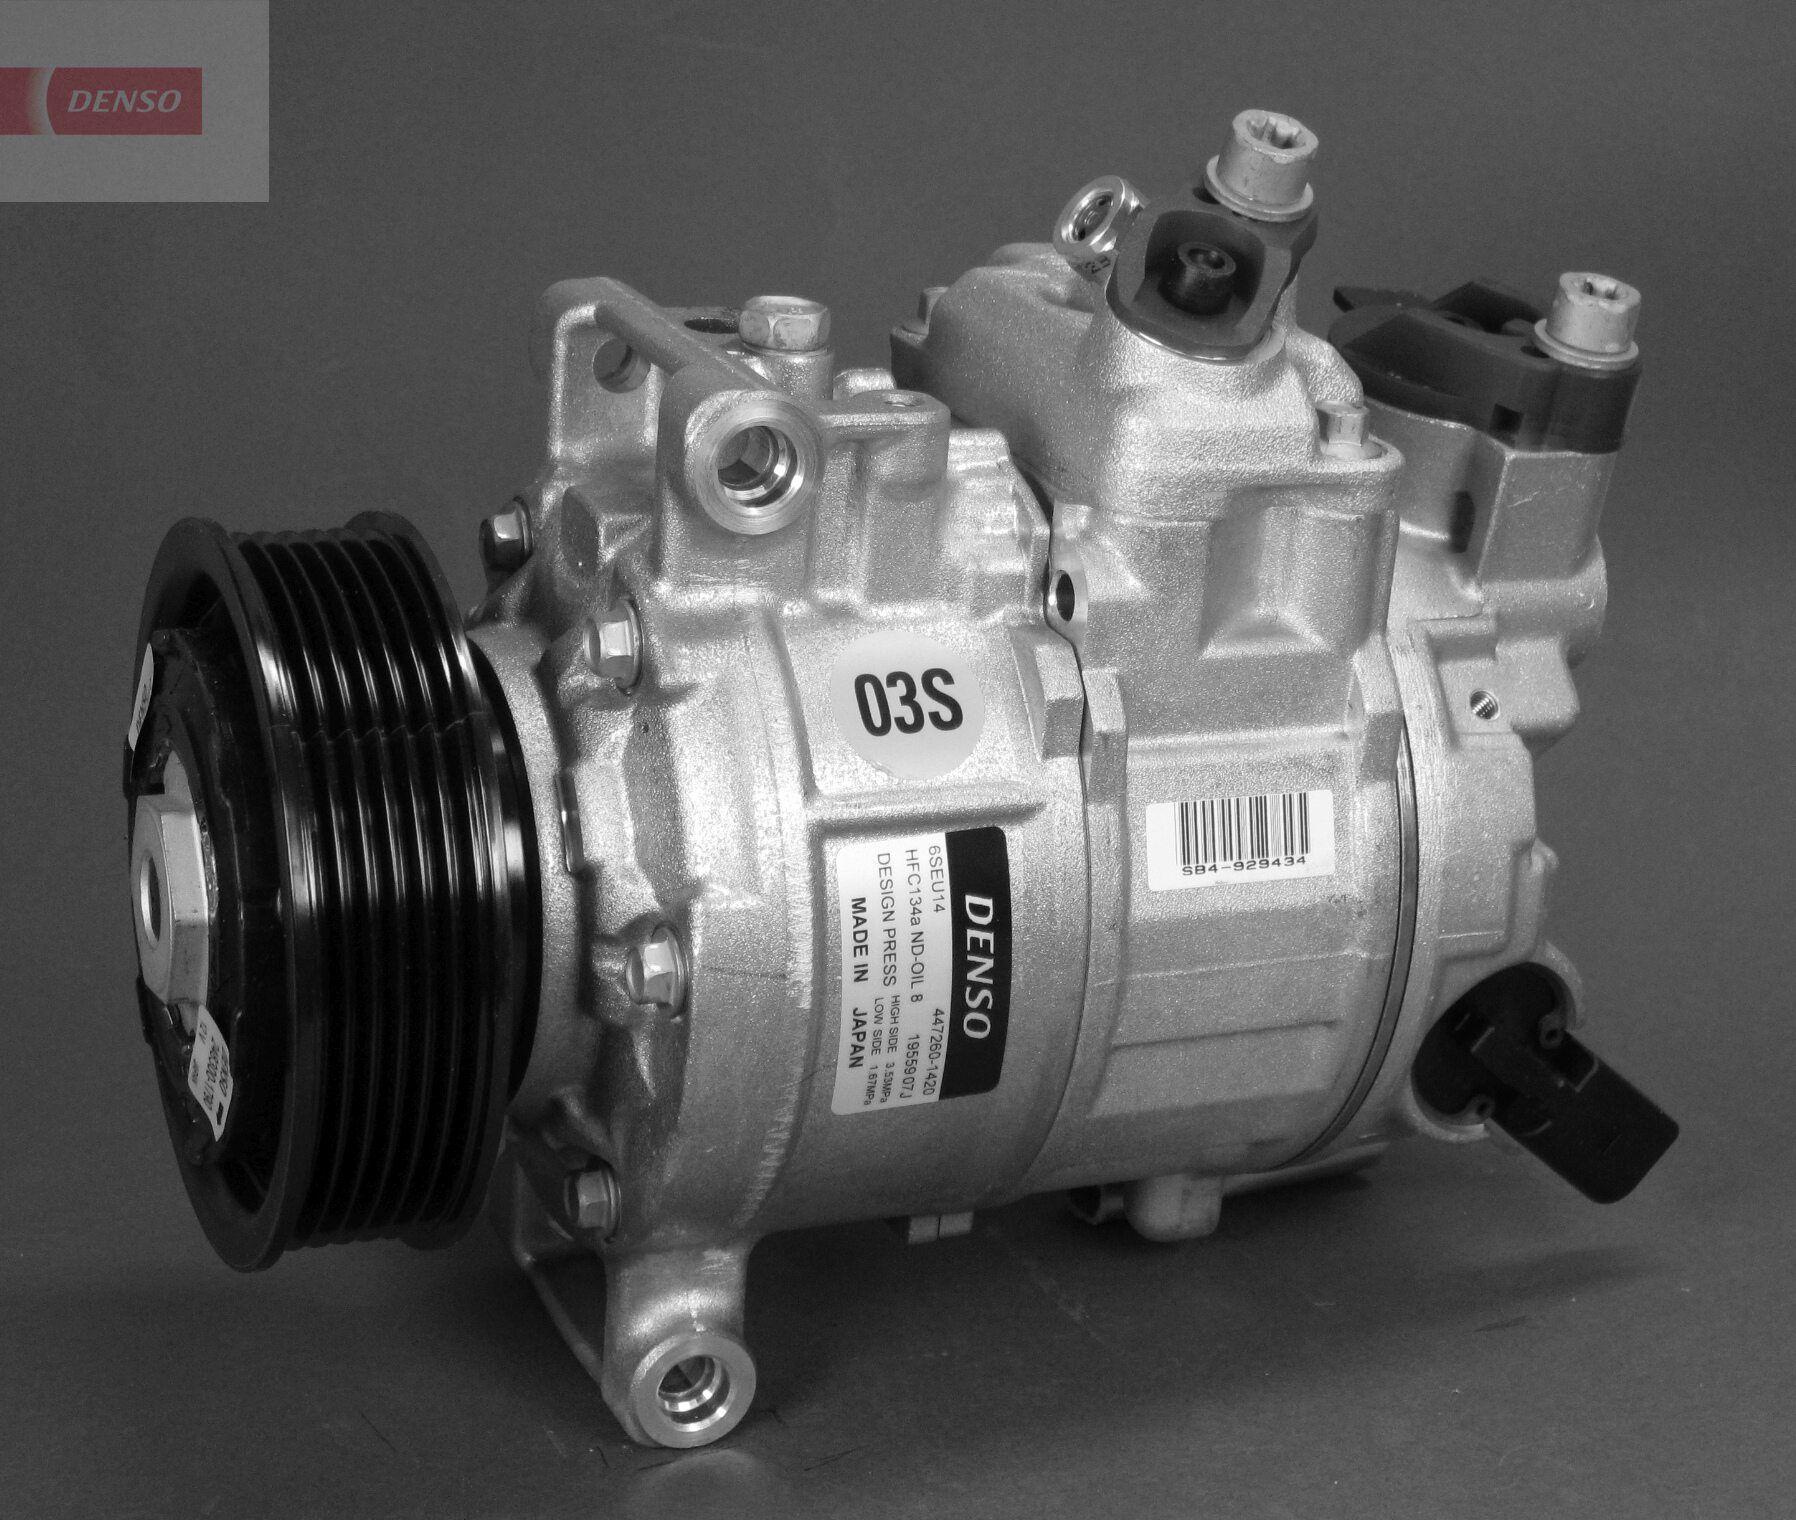 DCP02042 Klimakompressor DENSO Test